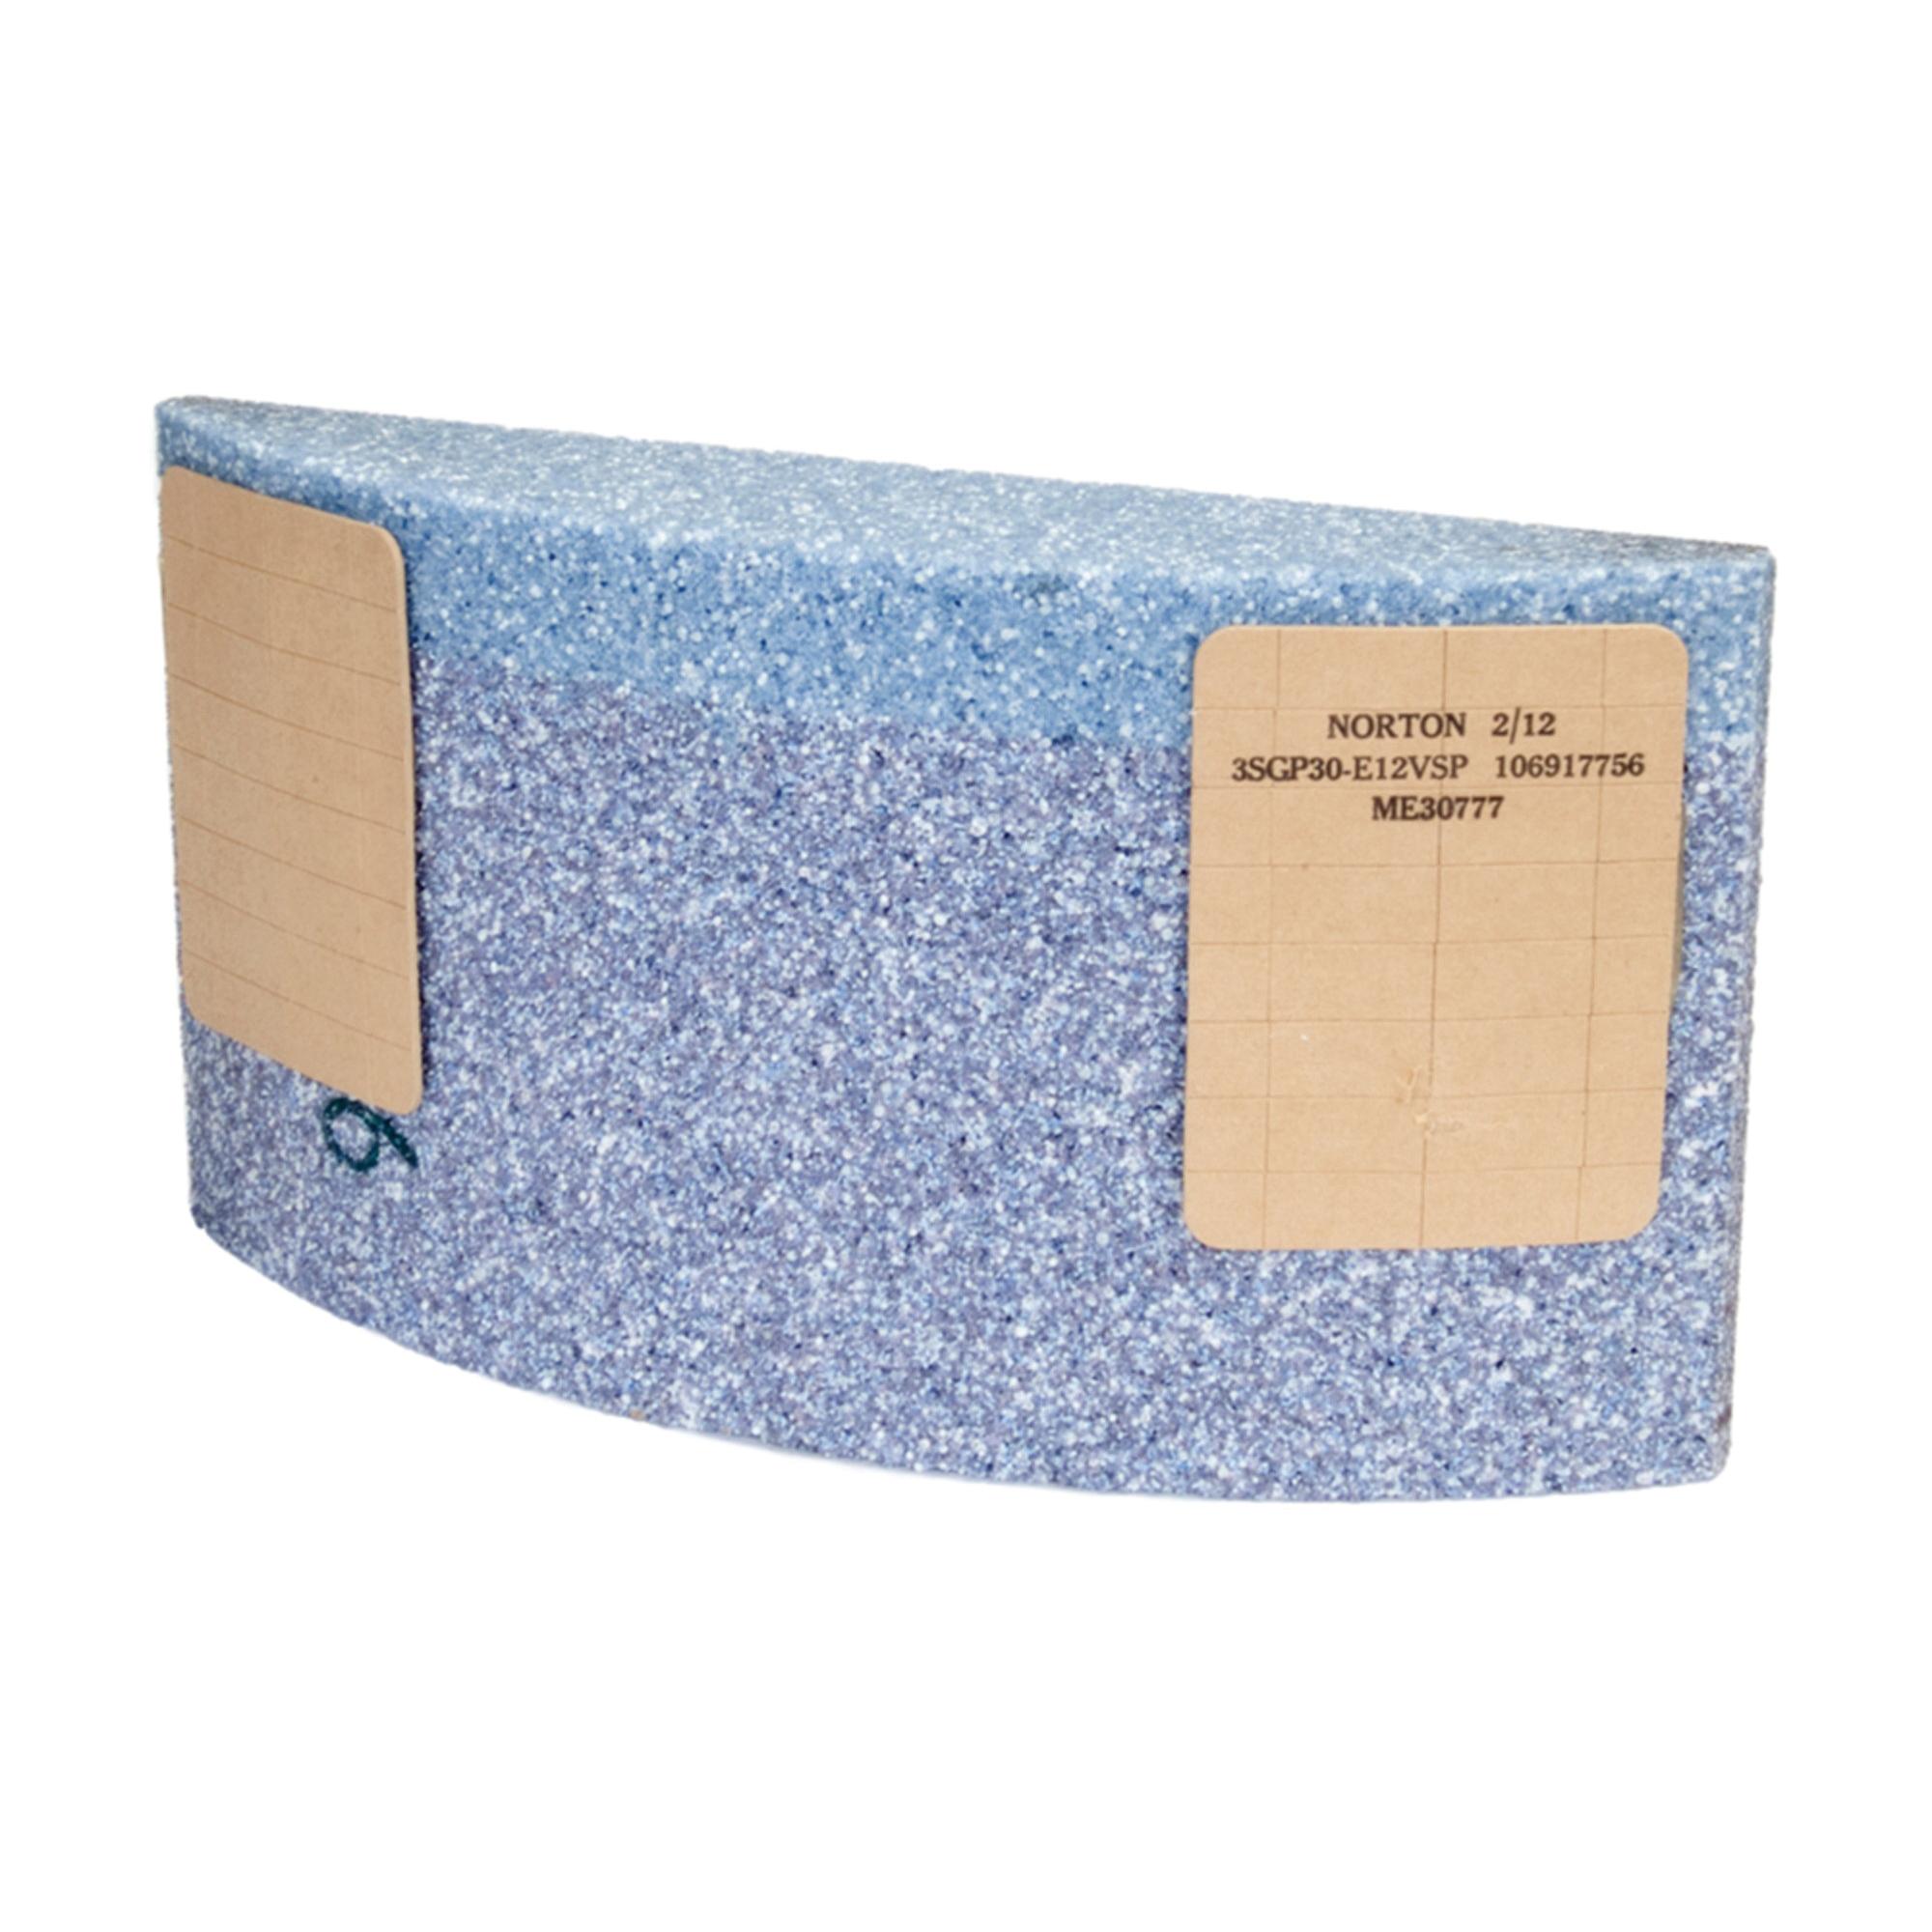 Norton® 61463604646 3SGP Type 31 Surface Grinding Segment, 6 in H x 11-1/4 in W x 2-1/4 in THK, 30 Grit, Ceramic Alumina Abrasive